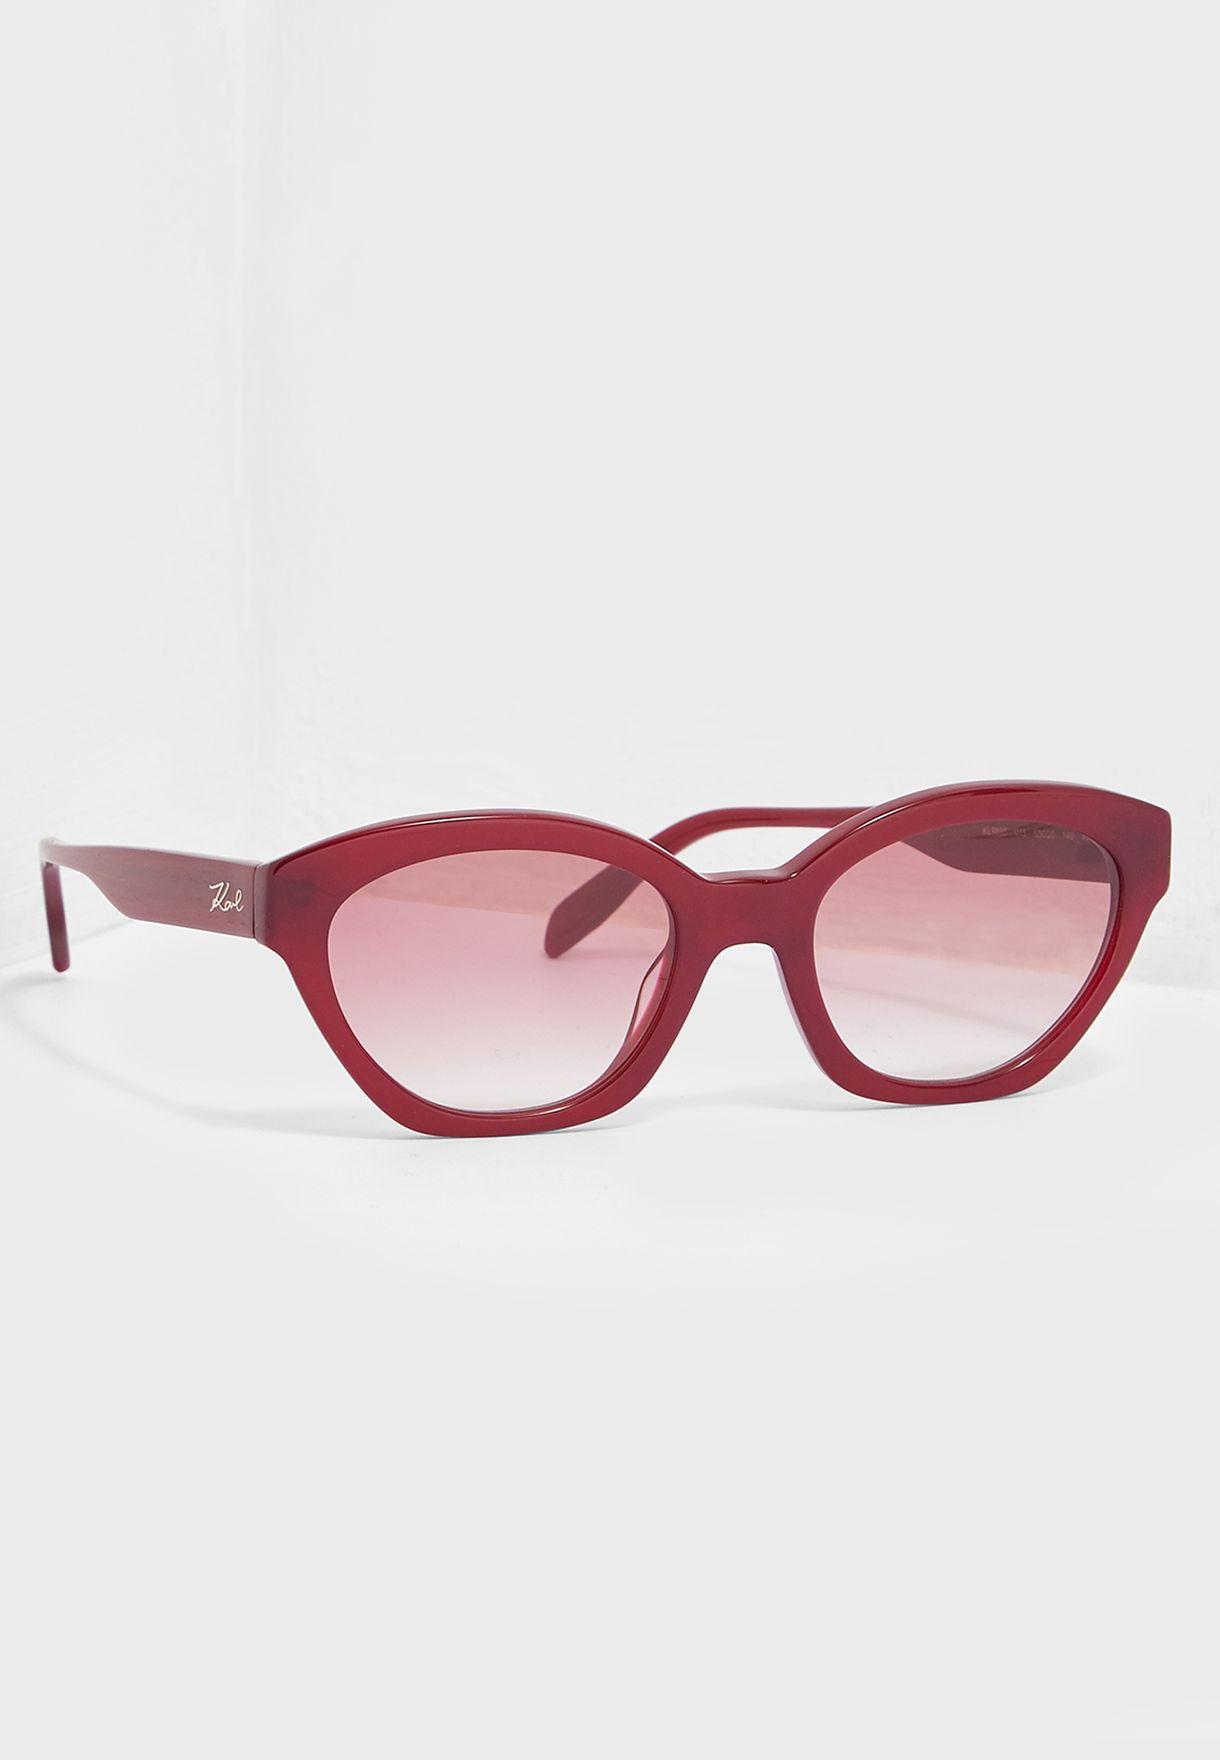 KL989S Oval Sunglasses